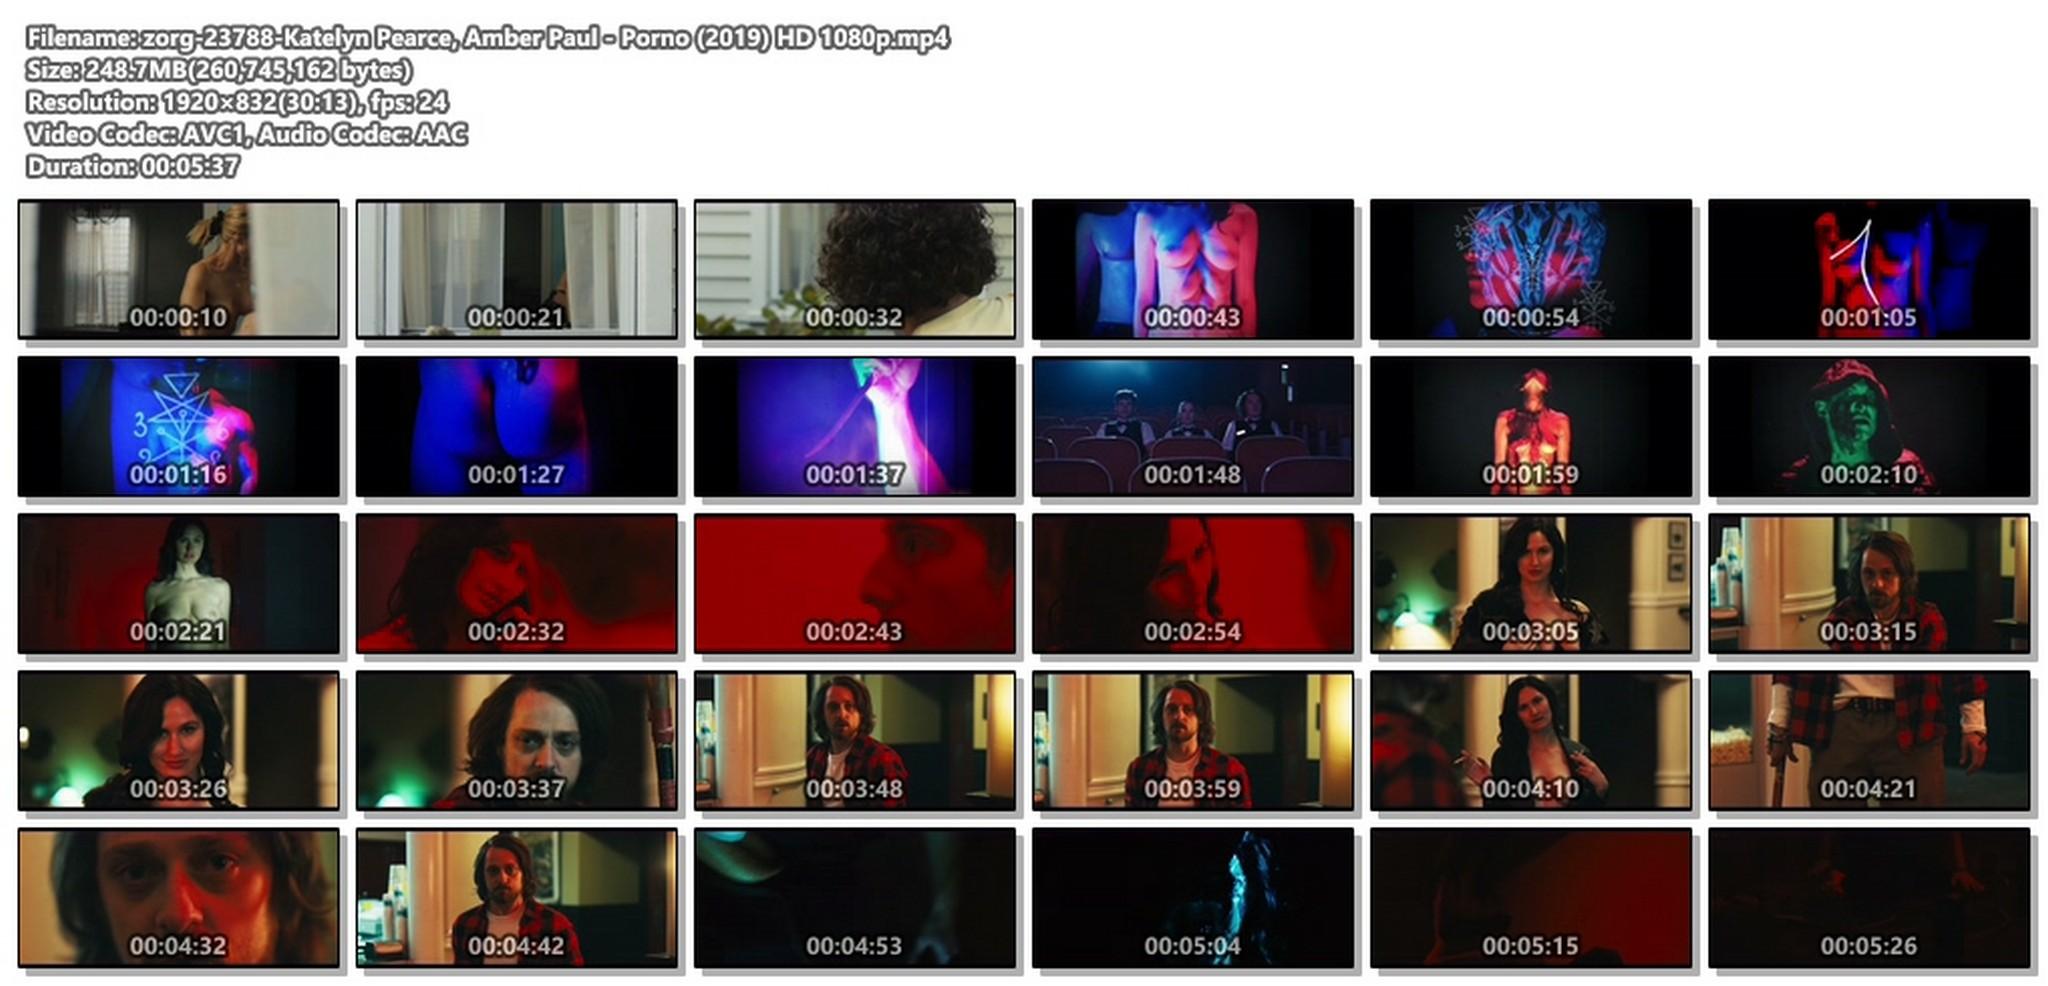 Katelyn Pearce nude full frontal Amber Paul nude sex - Porno (2019) HD 1080p (1)